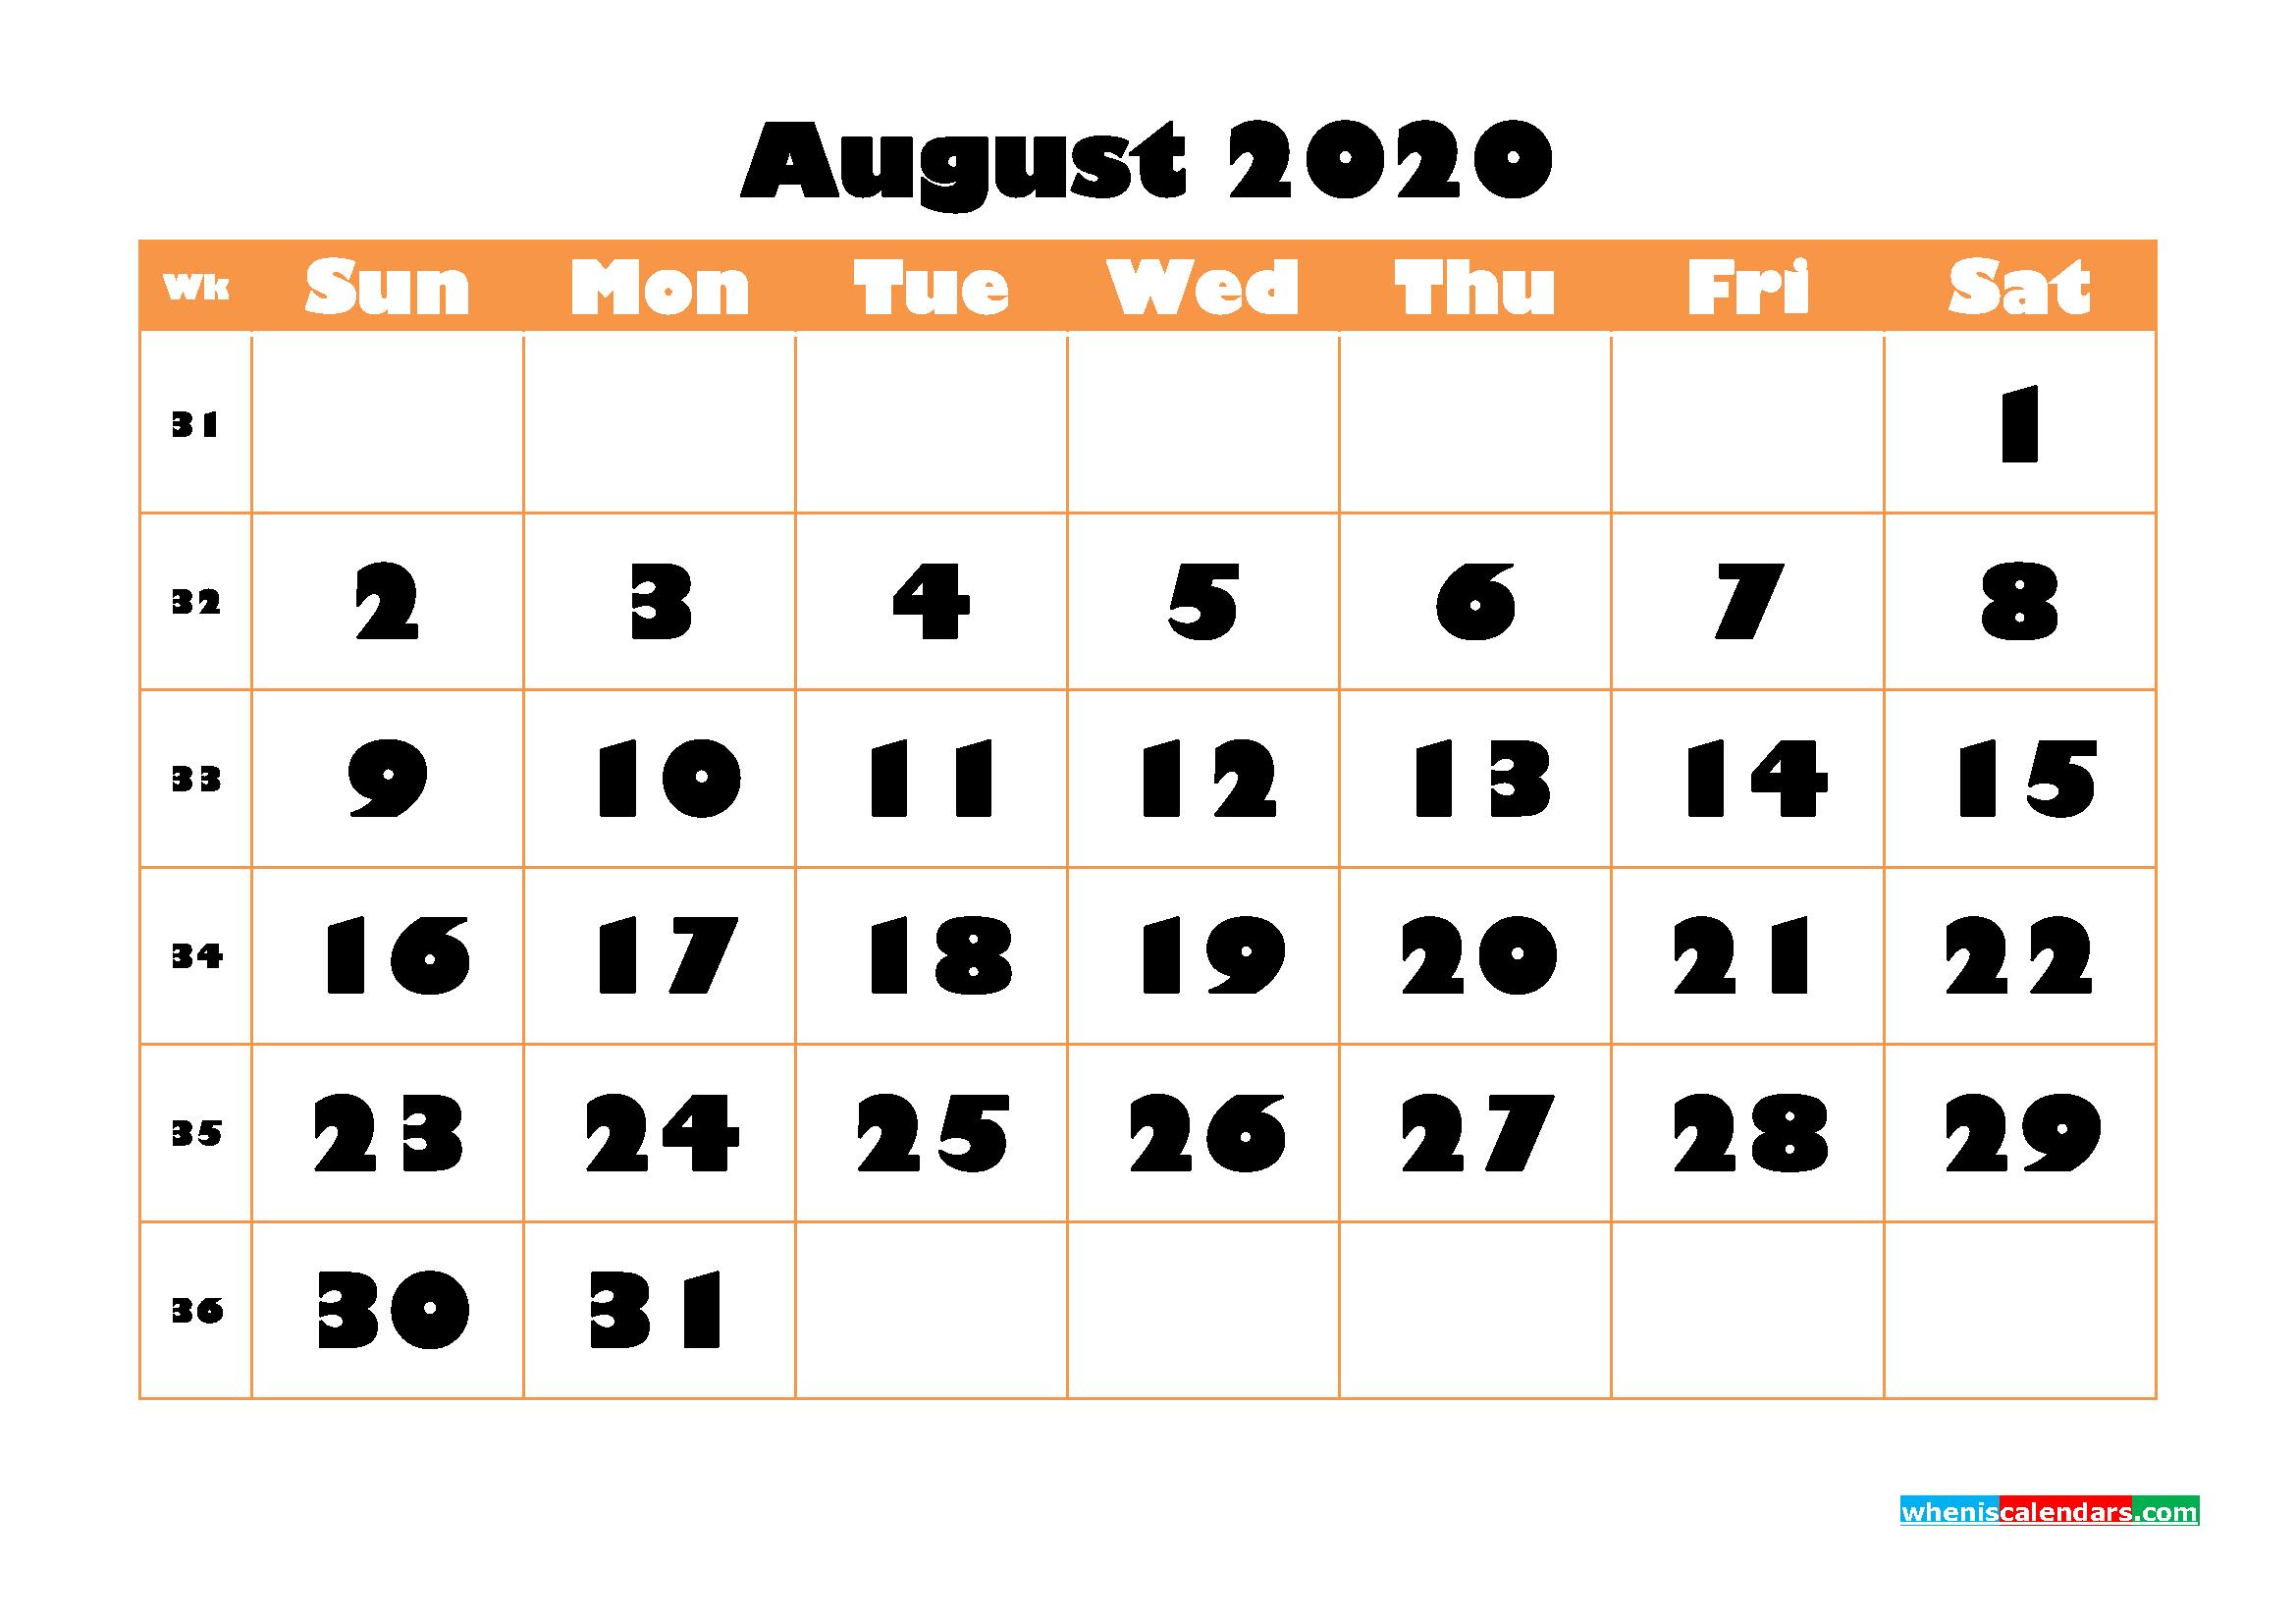 Blank August 2020 Calendar Printable - No.m20b776